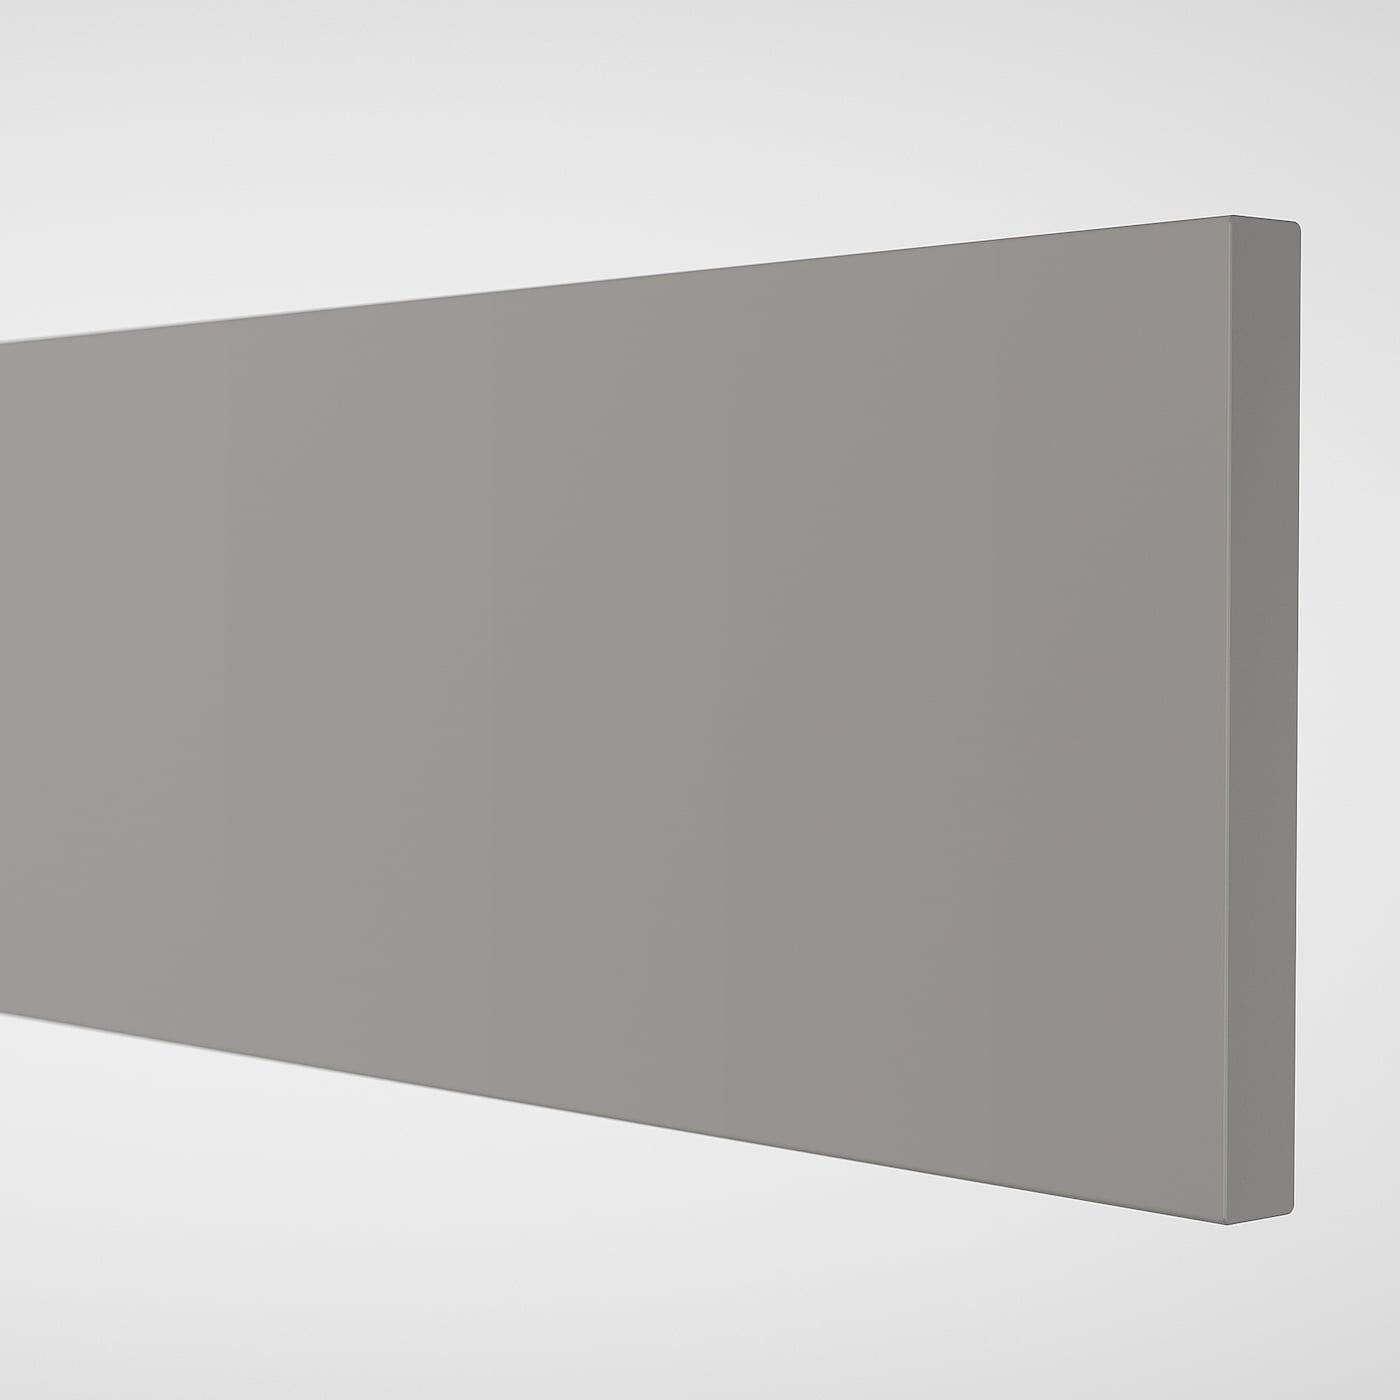 ENHET Drawer front, grey, 60x15 cm